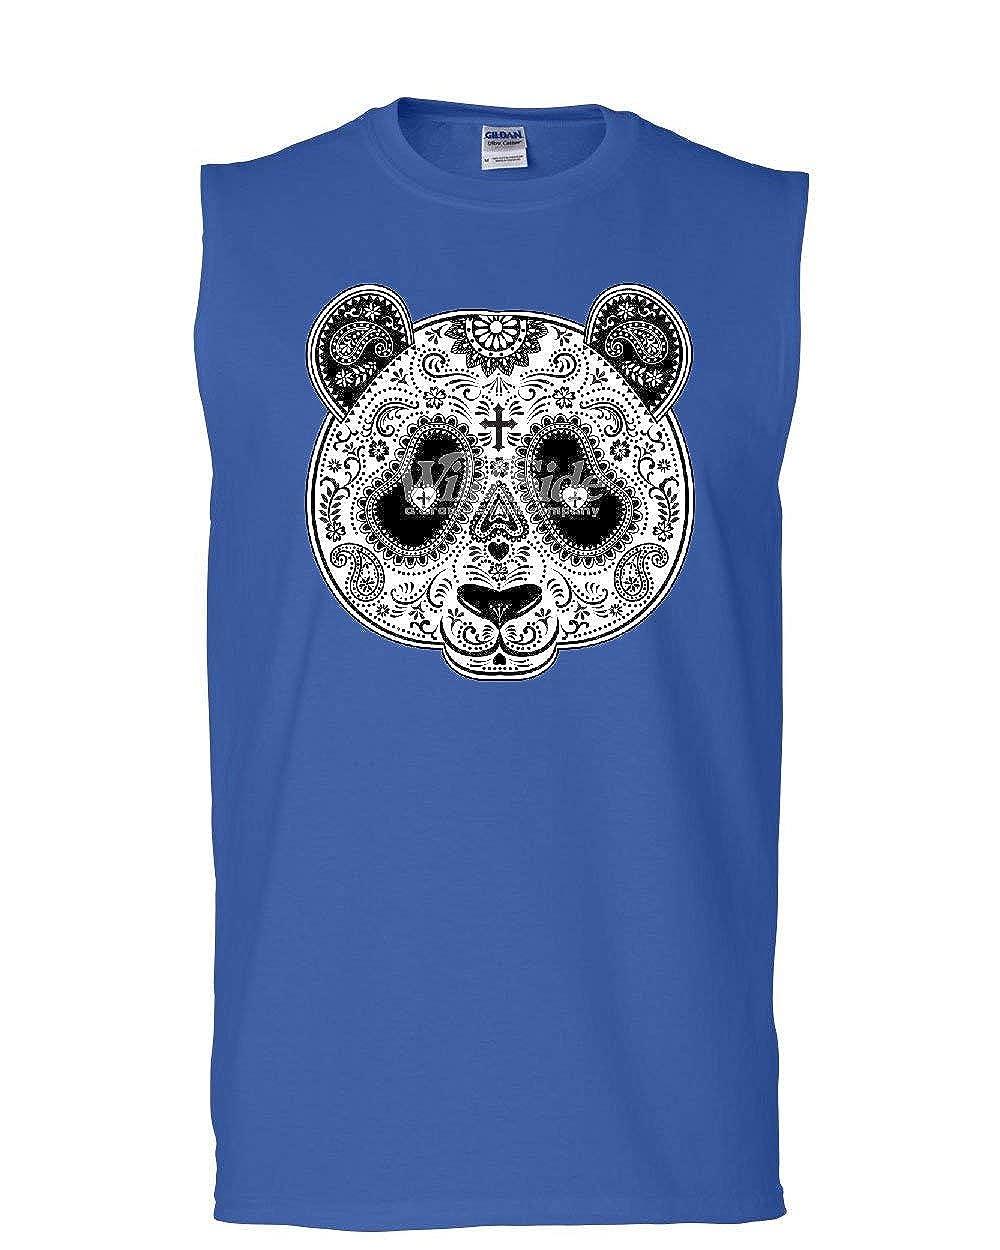 Day of The Dead Panda Mask Muscle Shirt Calavera Dia de Los Muertos Sleeveless